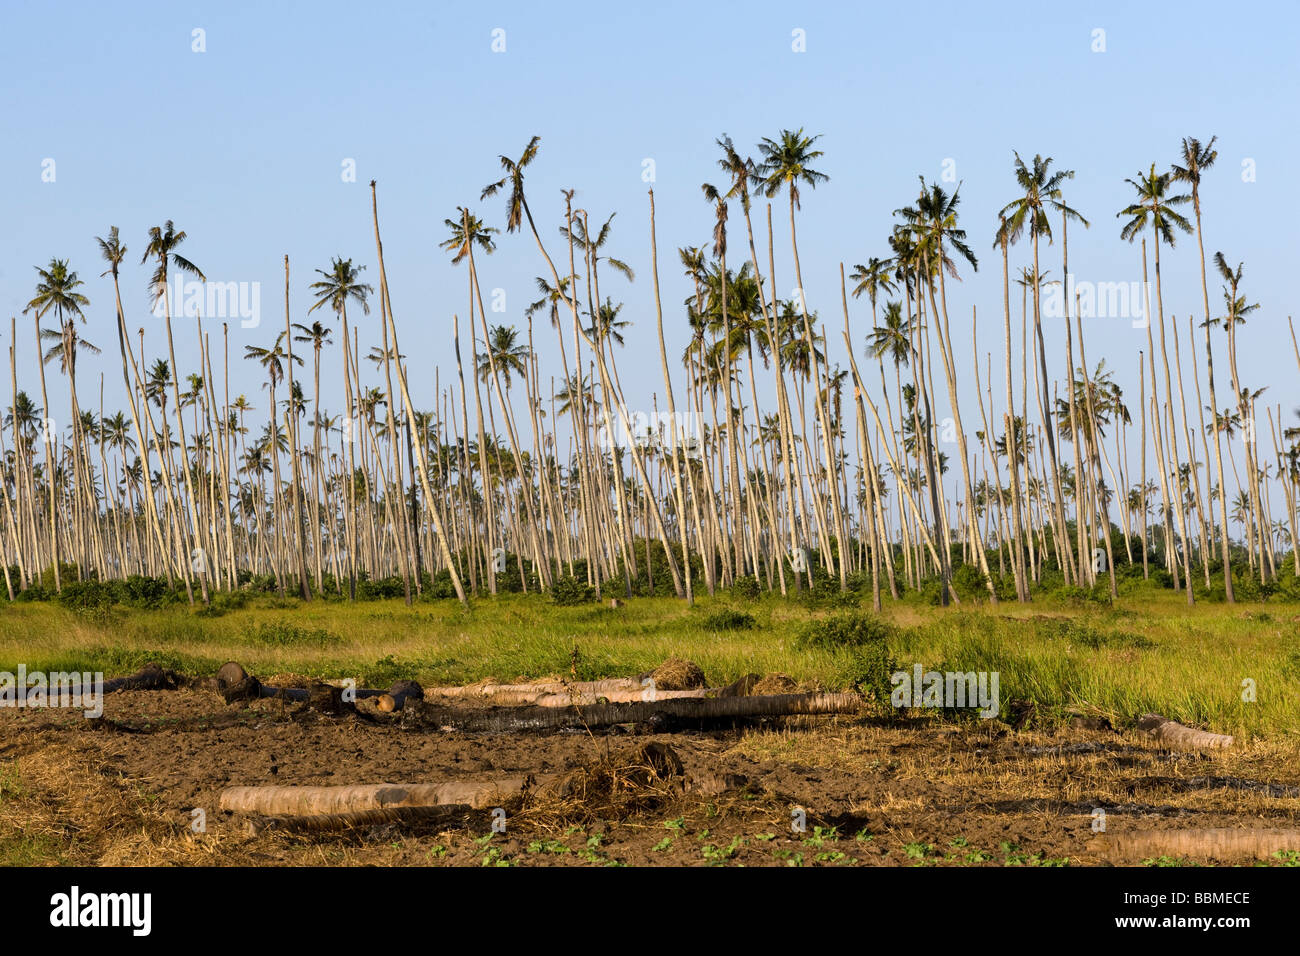 Coconut palms Cococ nucifera dying of a disease Quelimane Mozambique - Stock Image